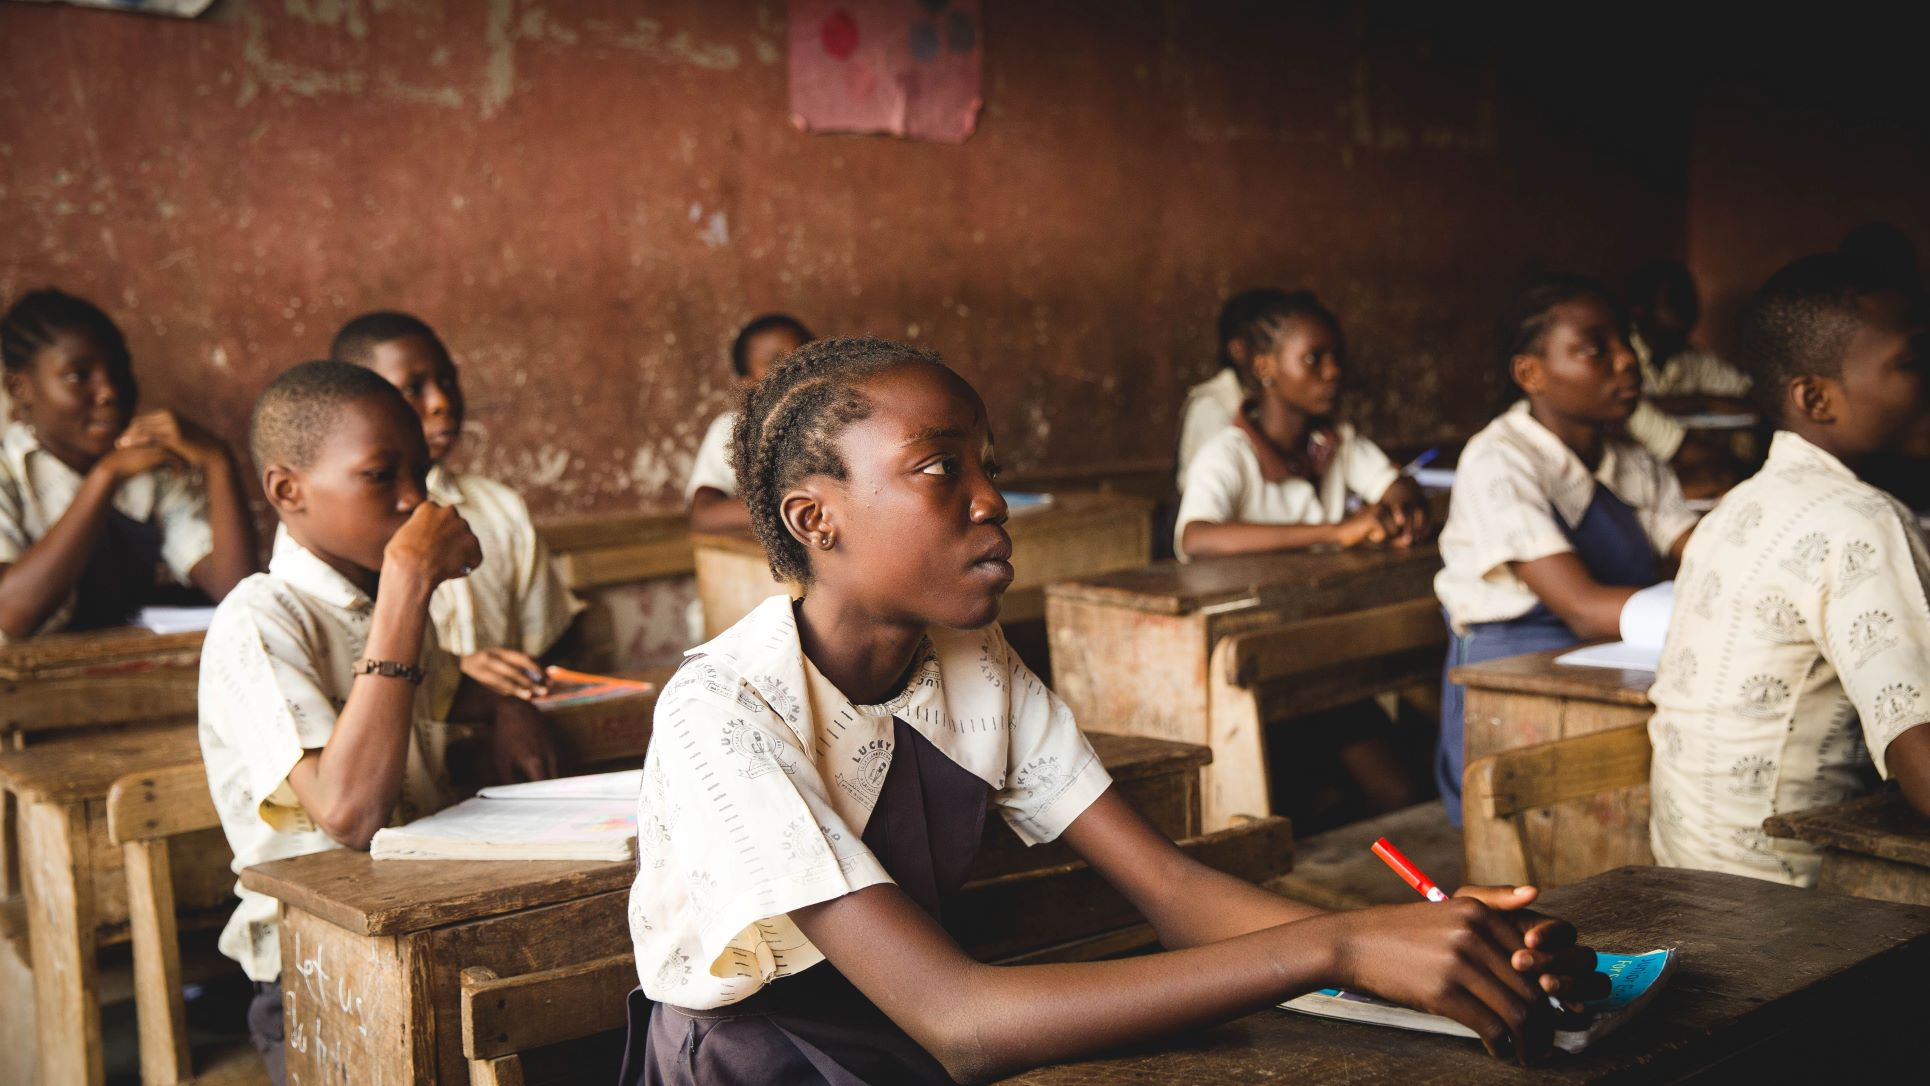 Fairtrade's Impact on Education